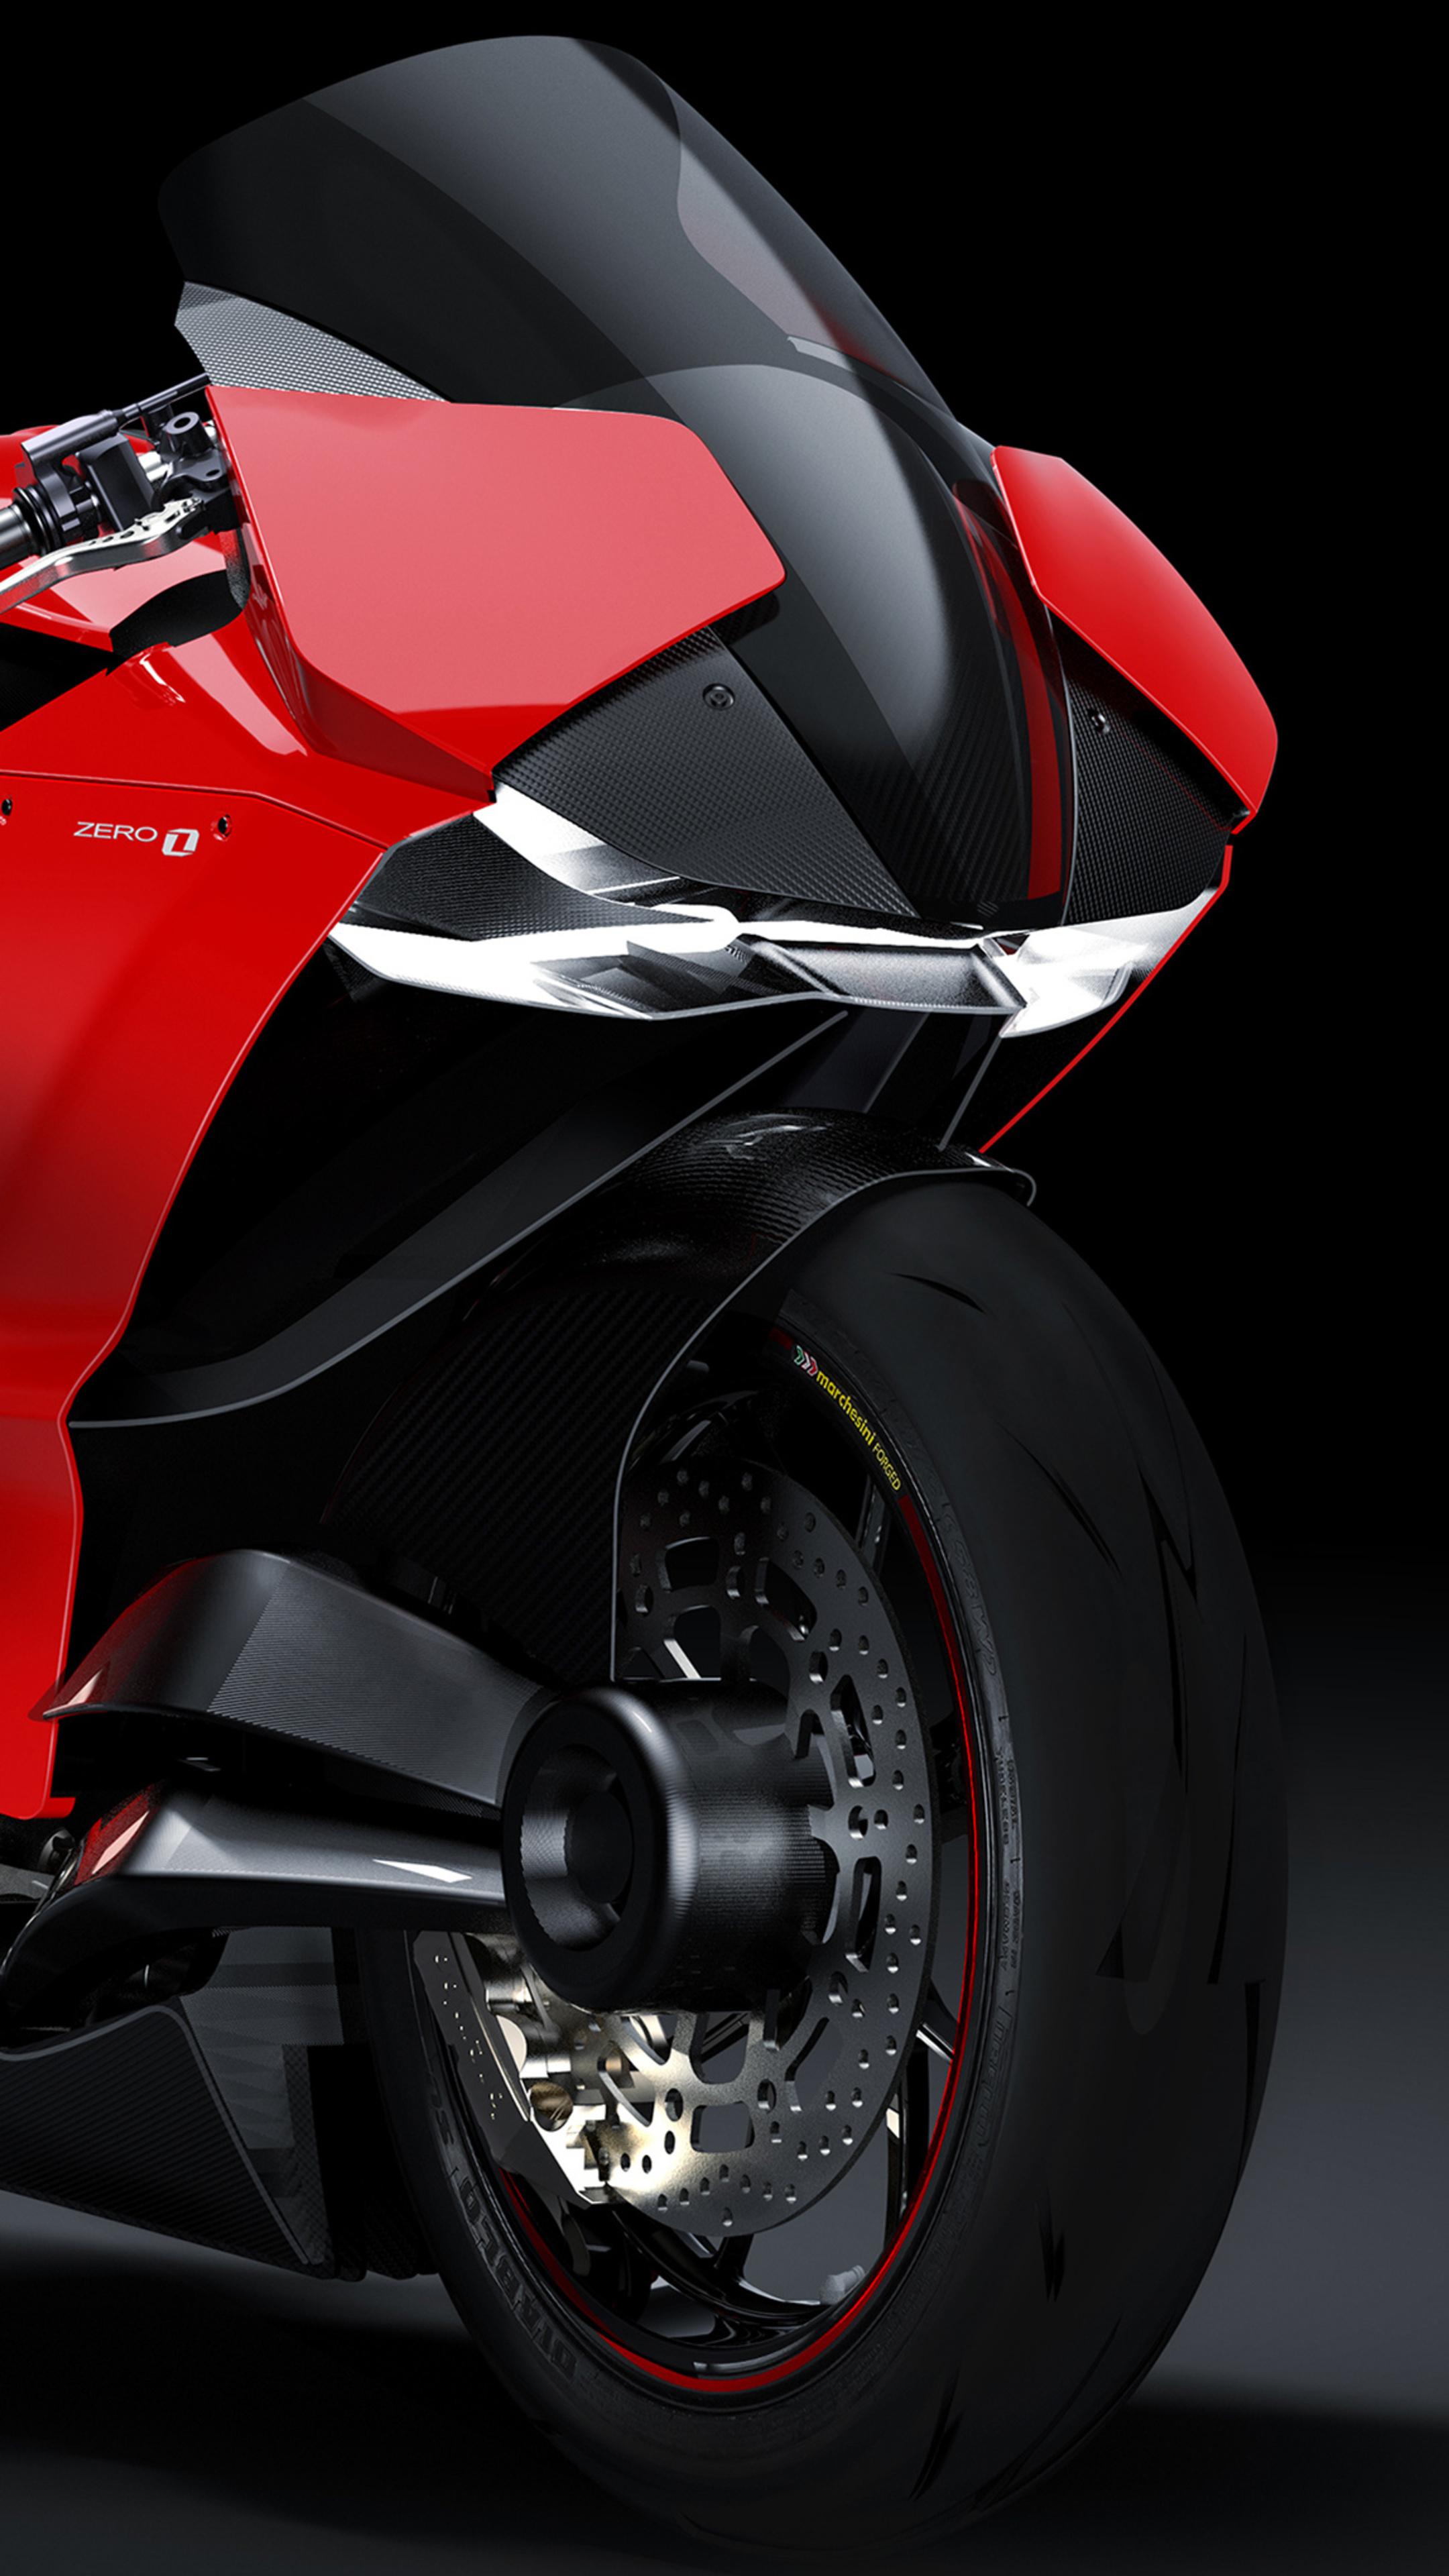 ducati-zero-electric-superbike-2020-oi.jpg